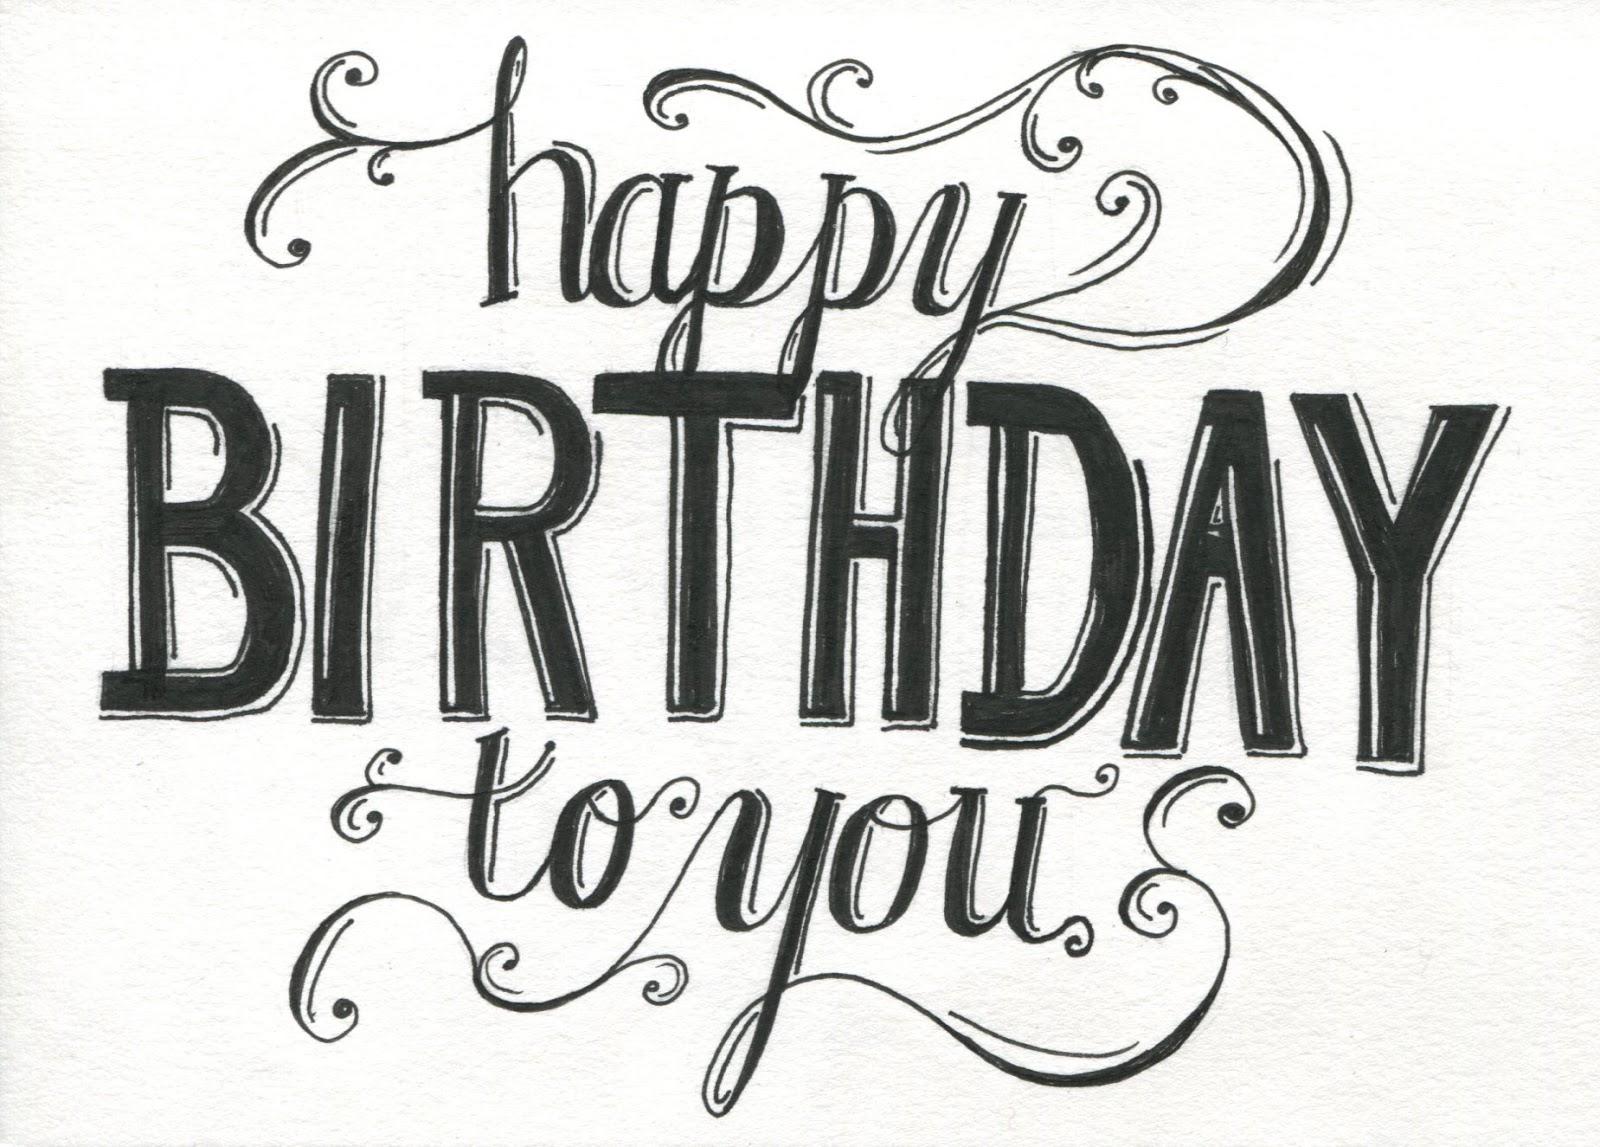 Drawn amd birthday Birthday Pinterest Coleen! Happy Bevan: